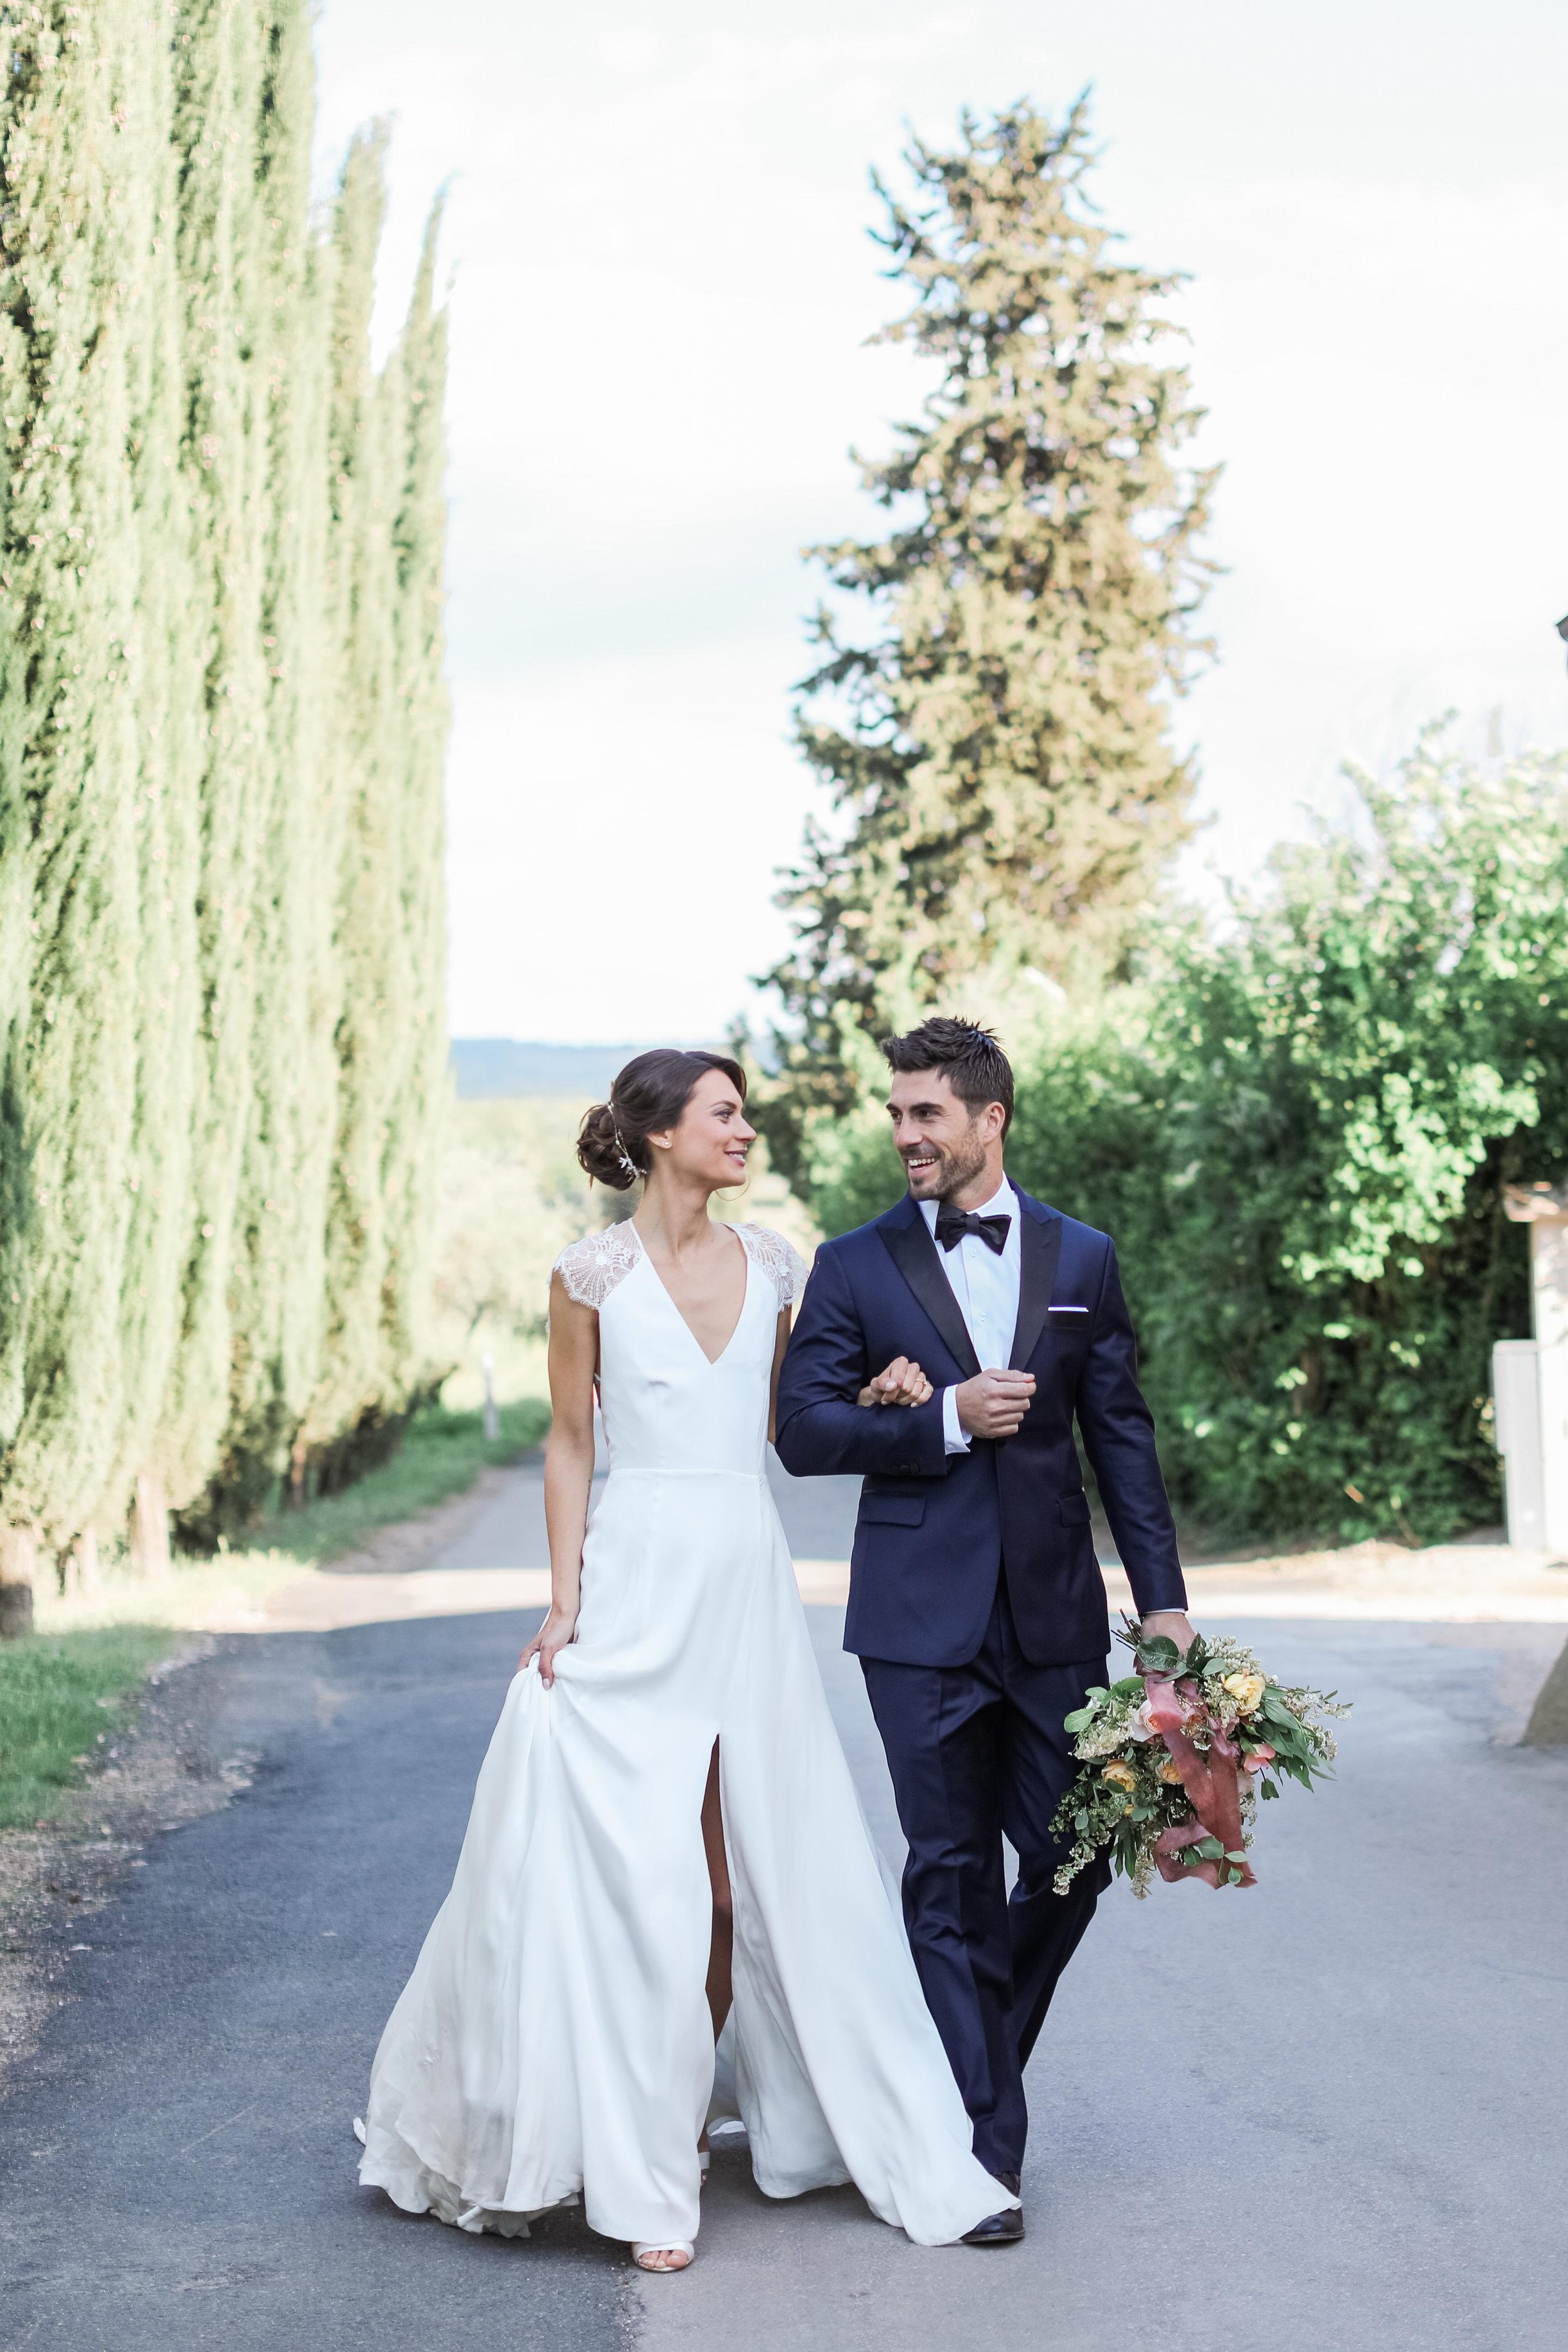 tuscany-wedding-photographer-68.jpg